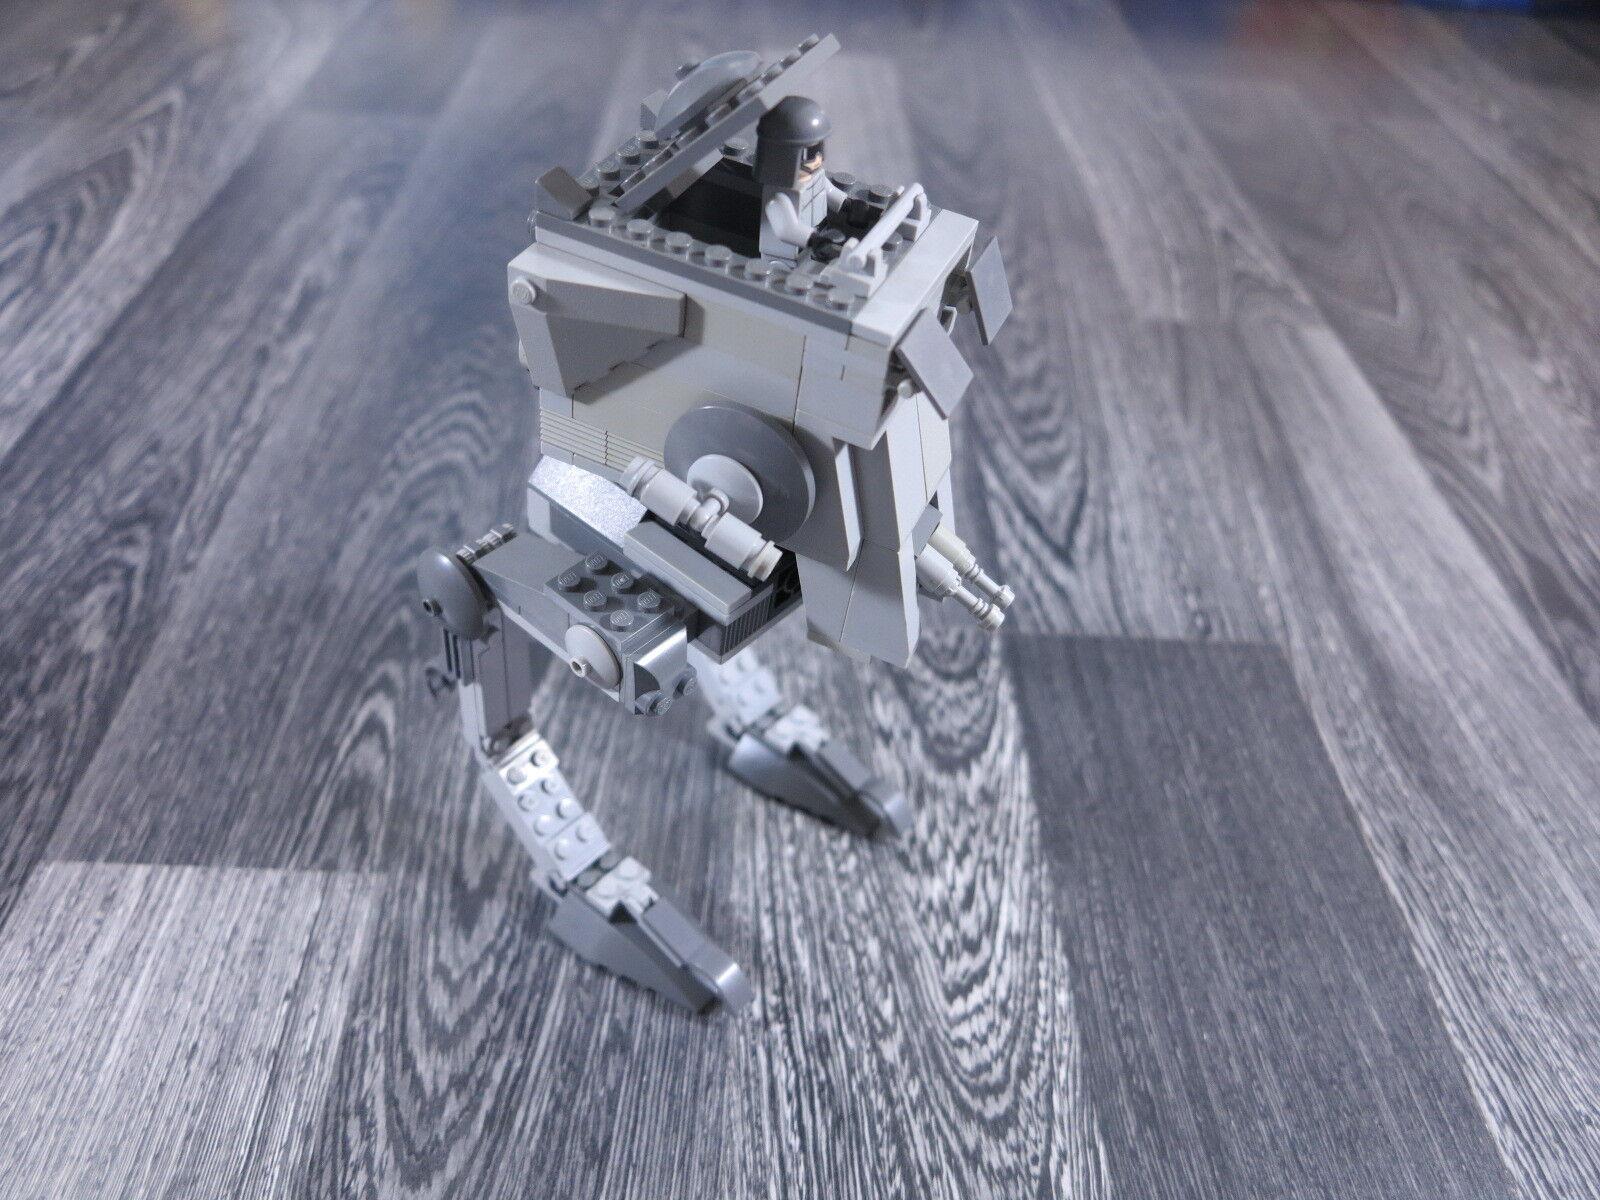 LEGO STAR WARS 7657 AT-ST AT-ST AT-ST mit Bauanleitung 8b02fe